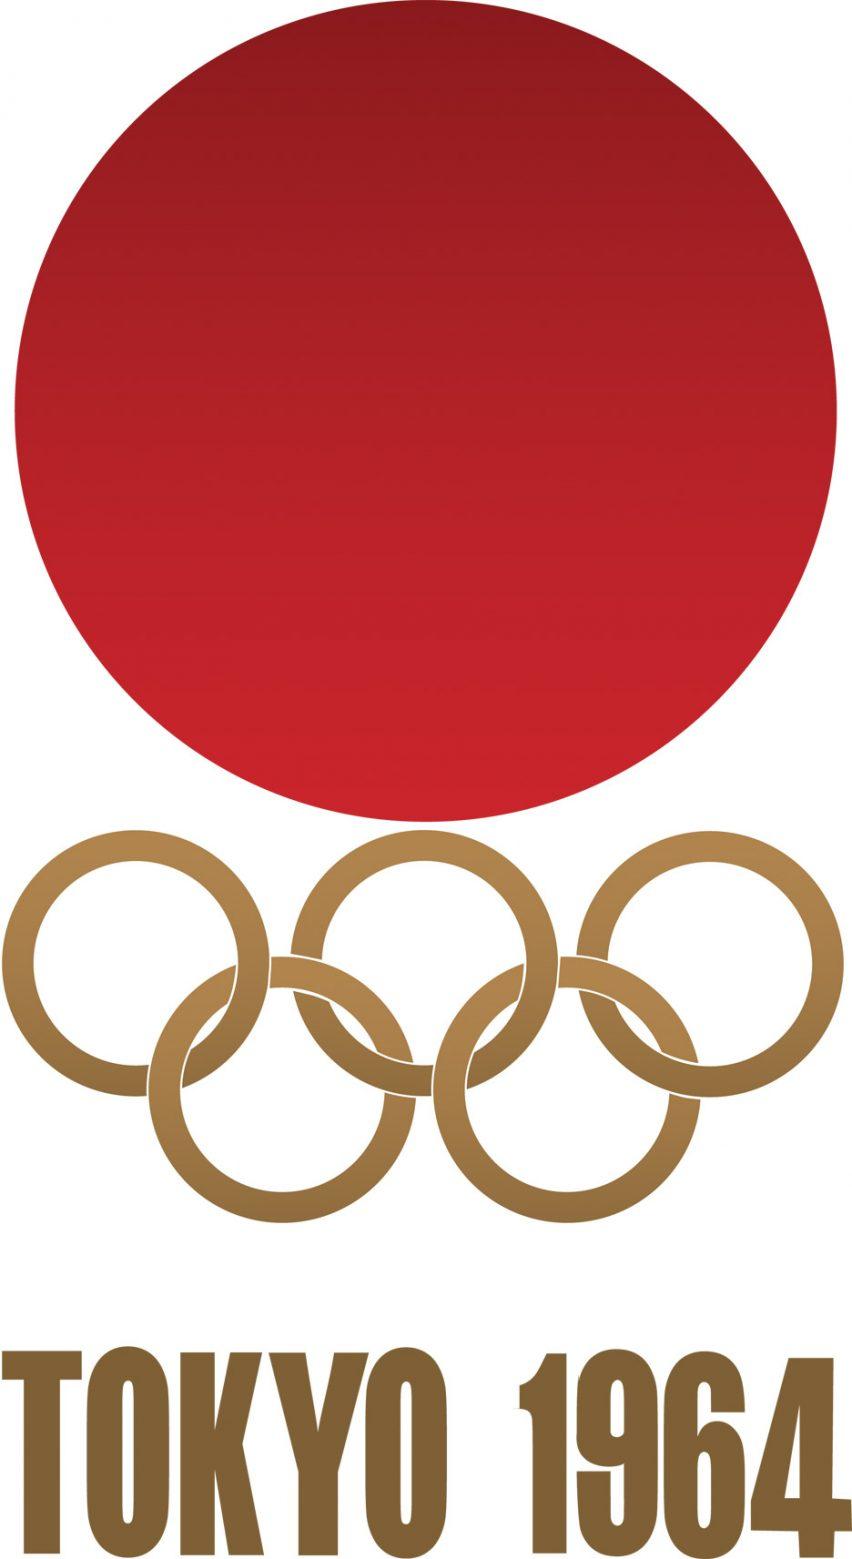 Logo of the 1964 Tokyo Olympics